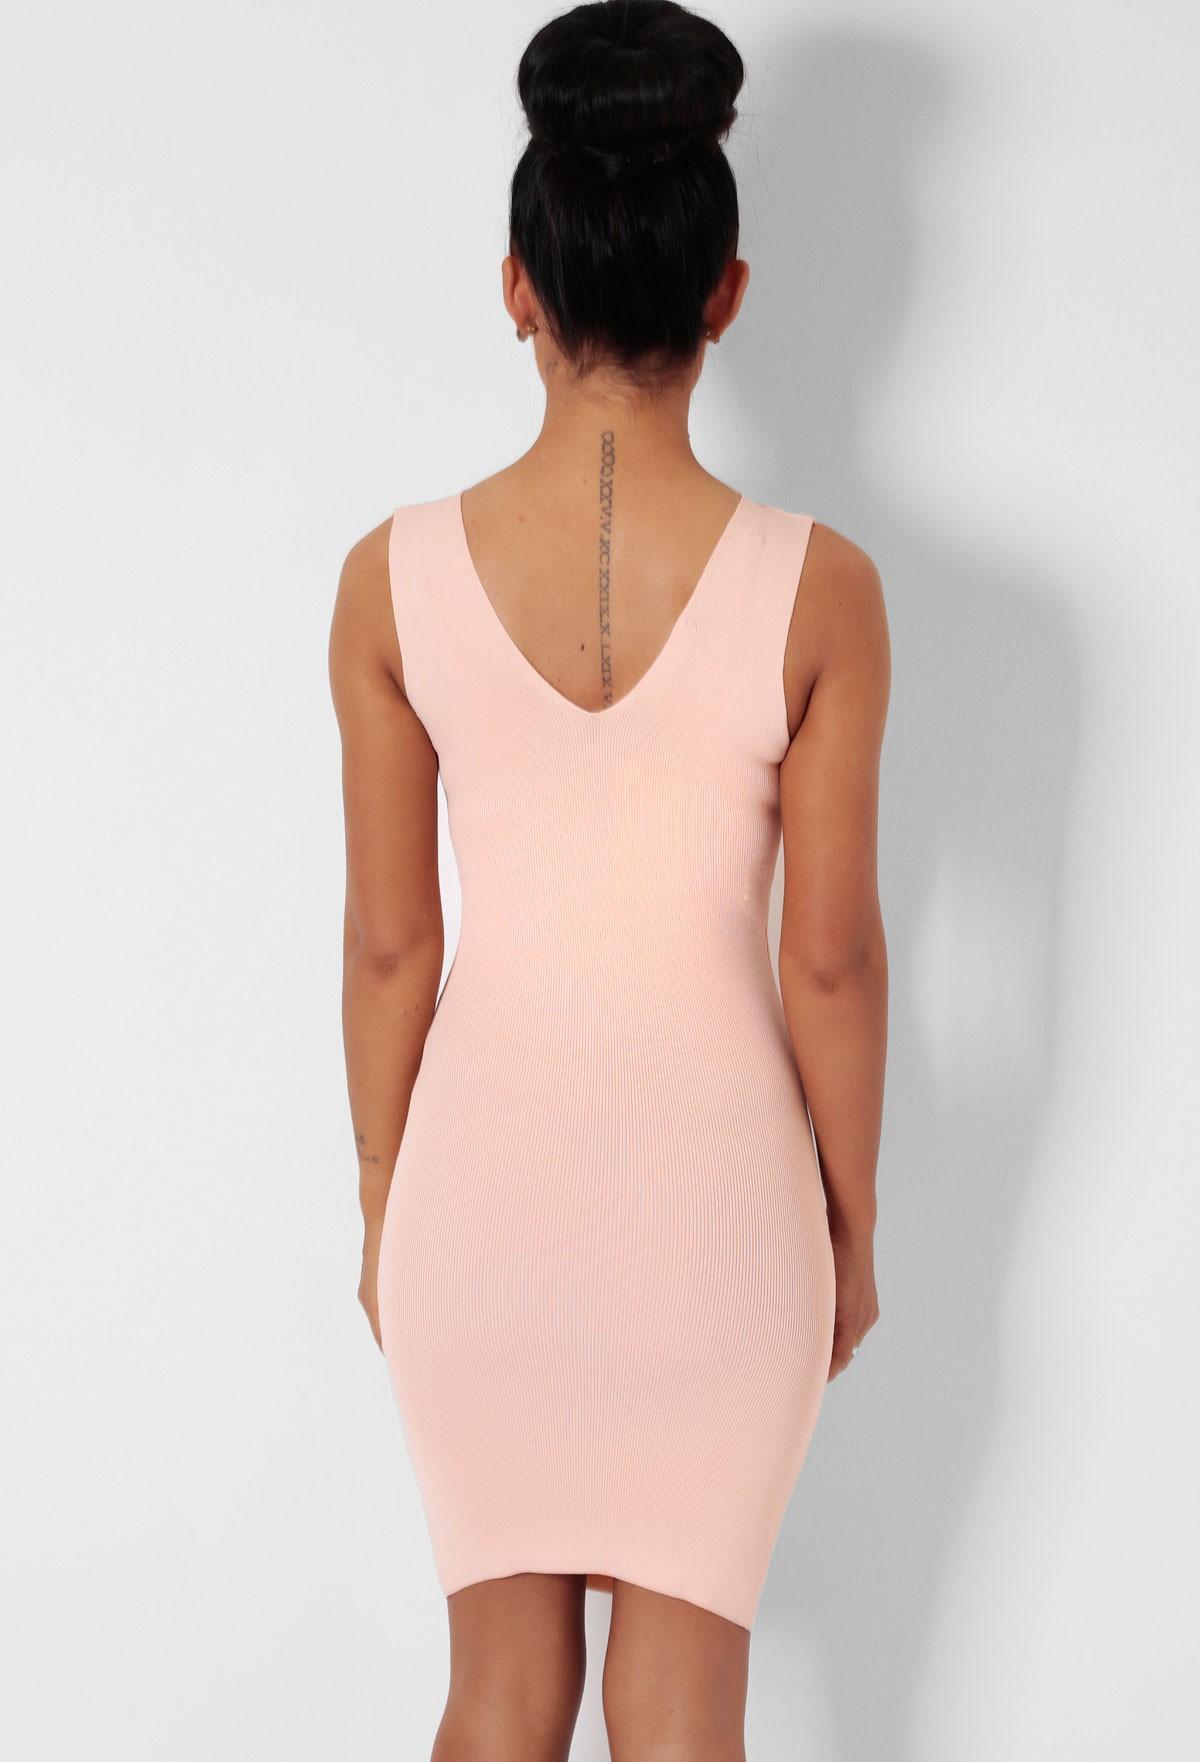 Almond Nude Bodycon Sleeveless Mini Dress | Pink Boutique